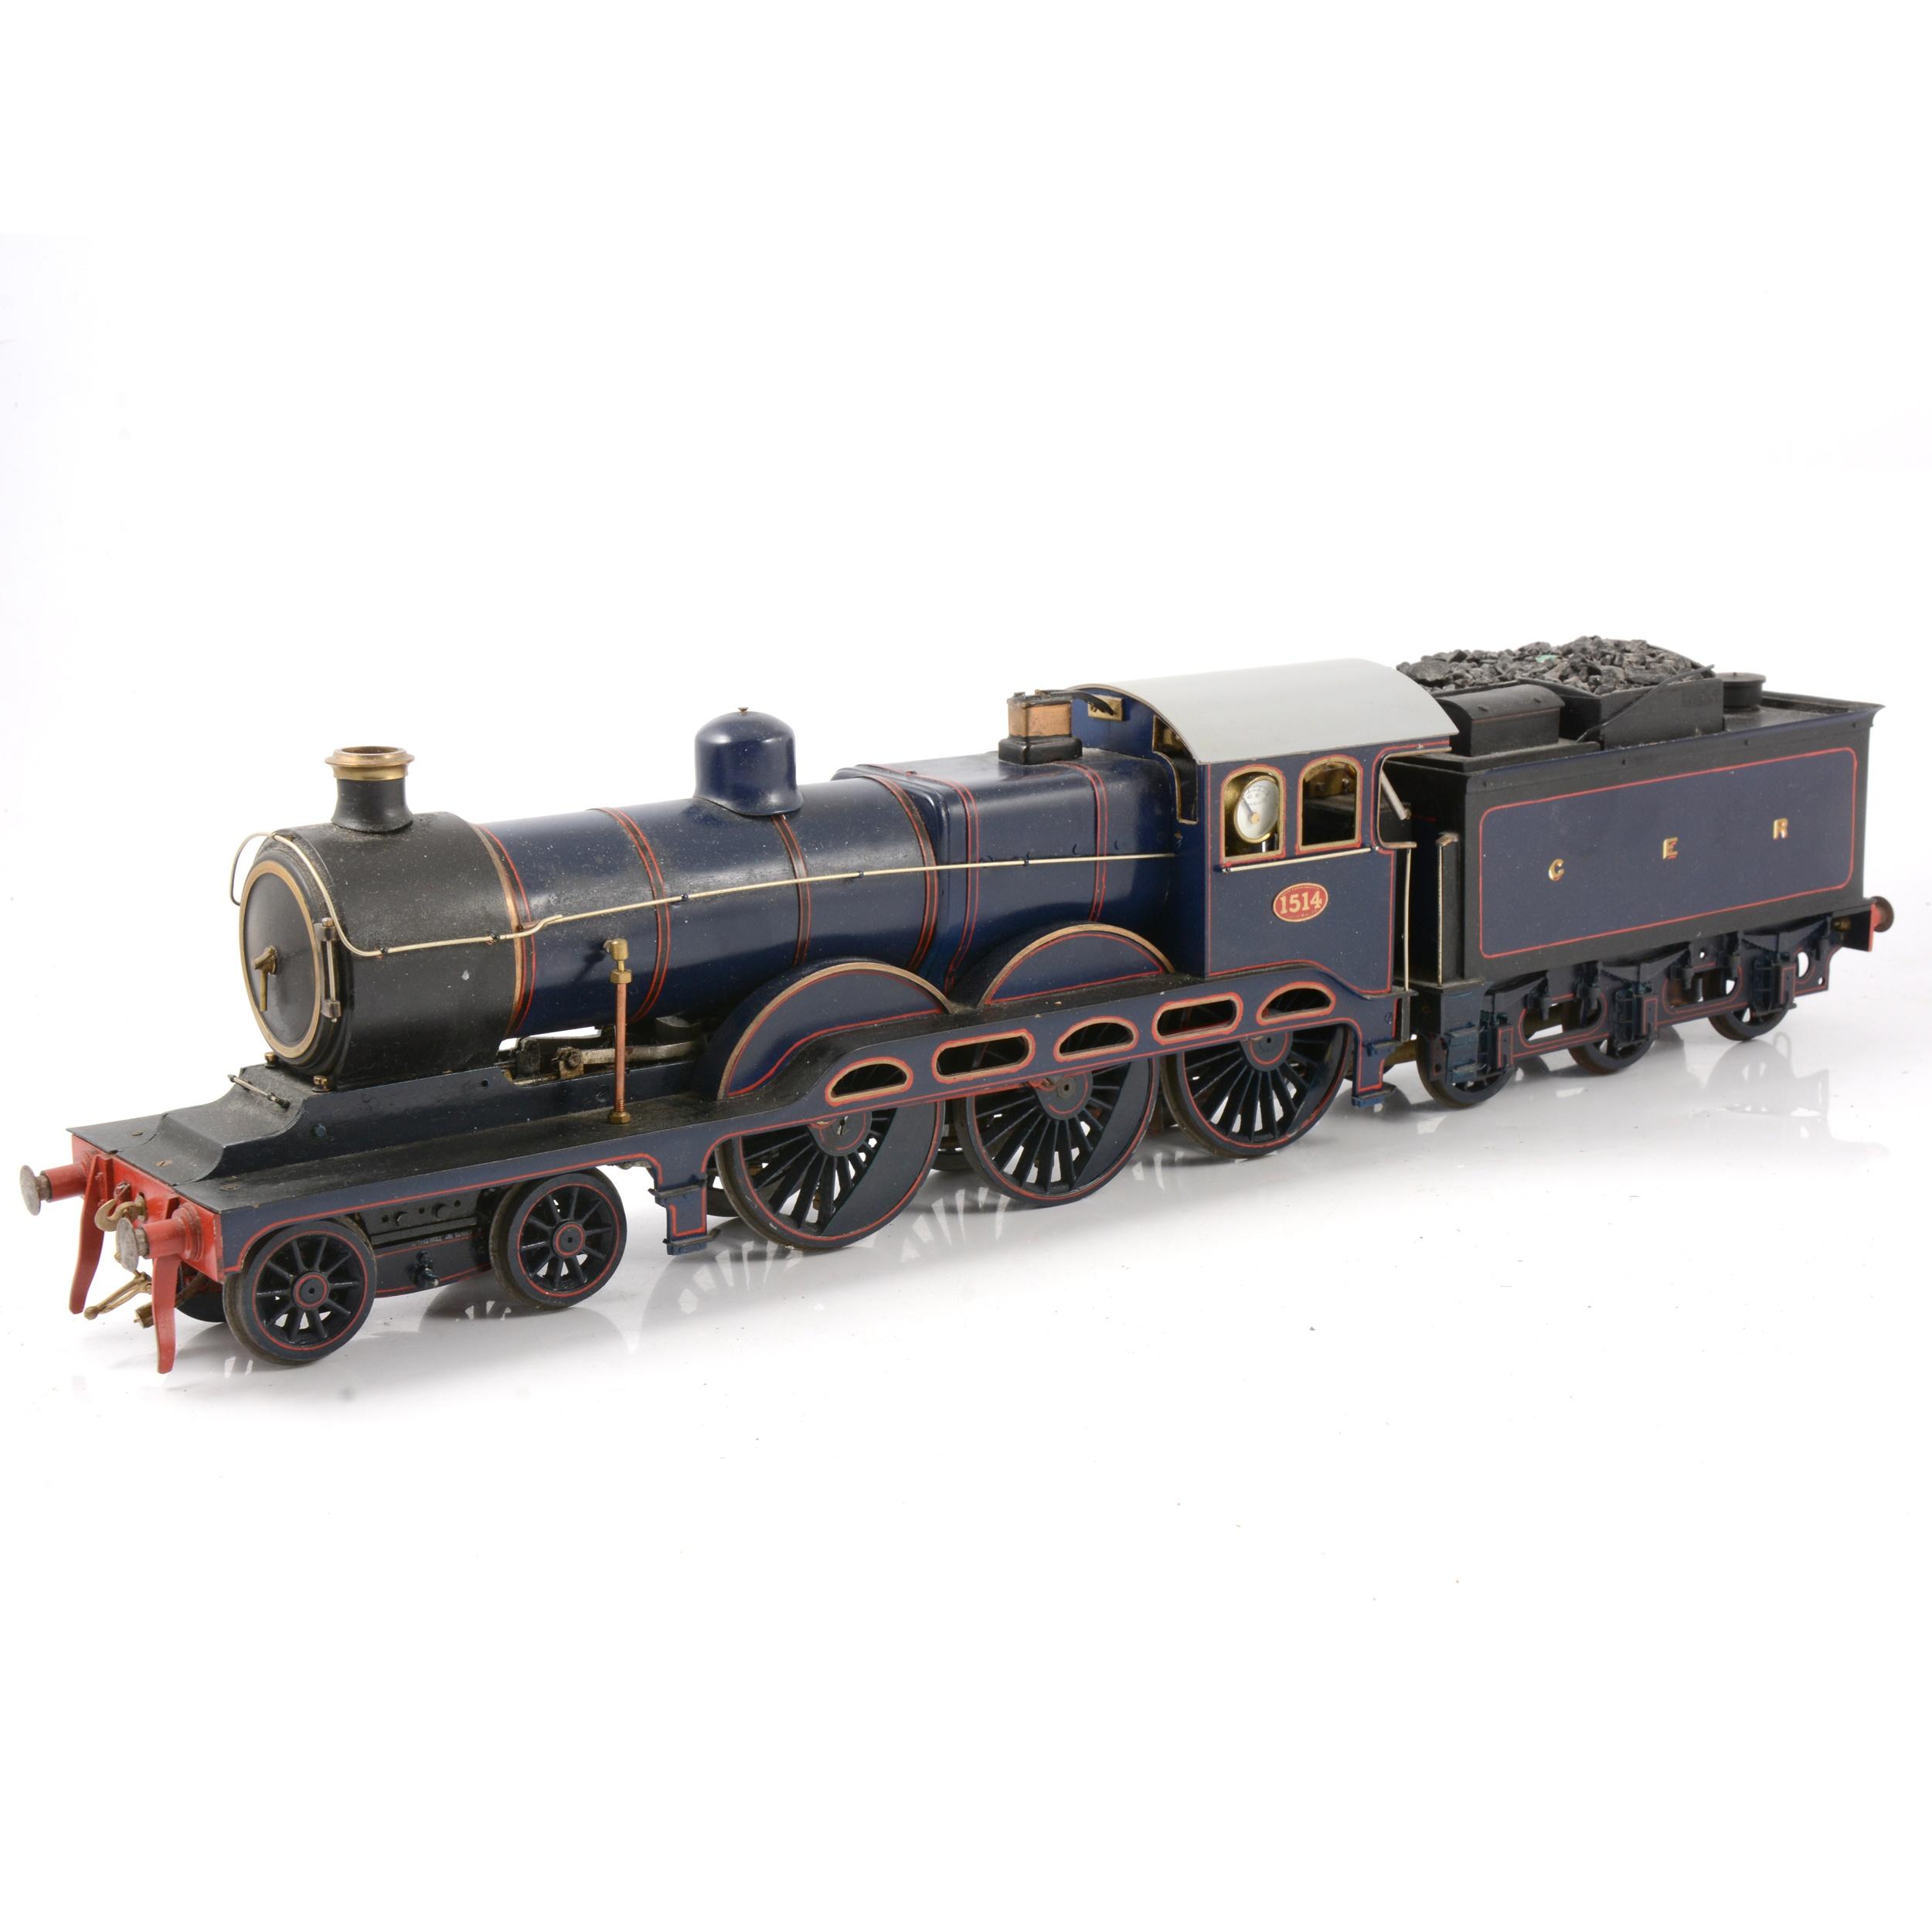 A well-built live steam gauge 1 / G scale, 45mm locomotive, GER, 4-6-0 no.1514 'Royal Train'